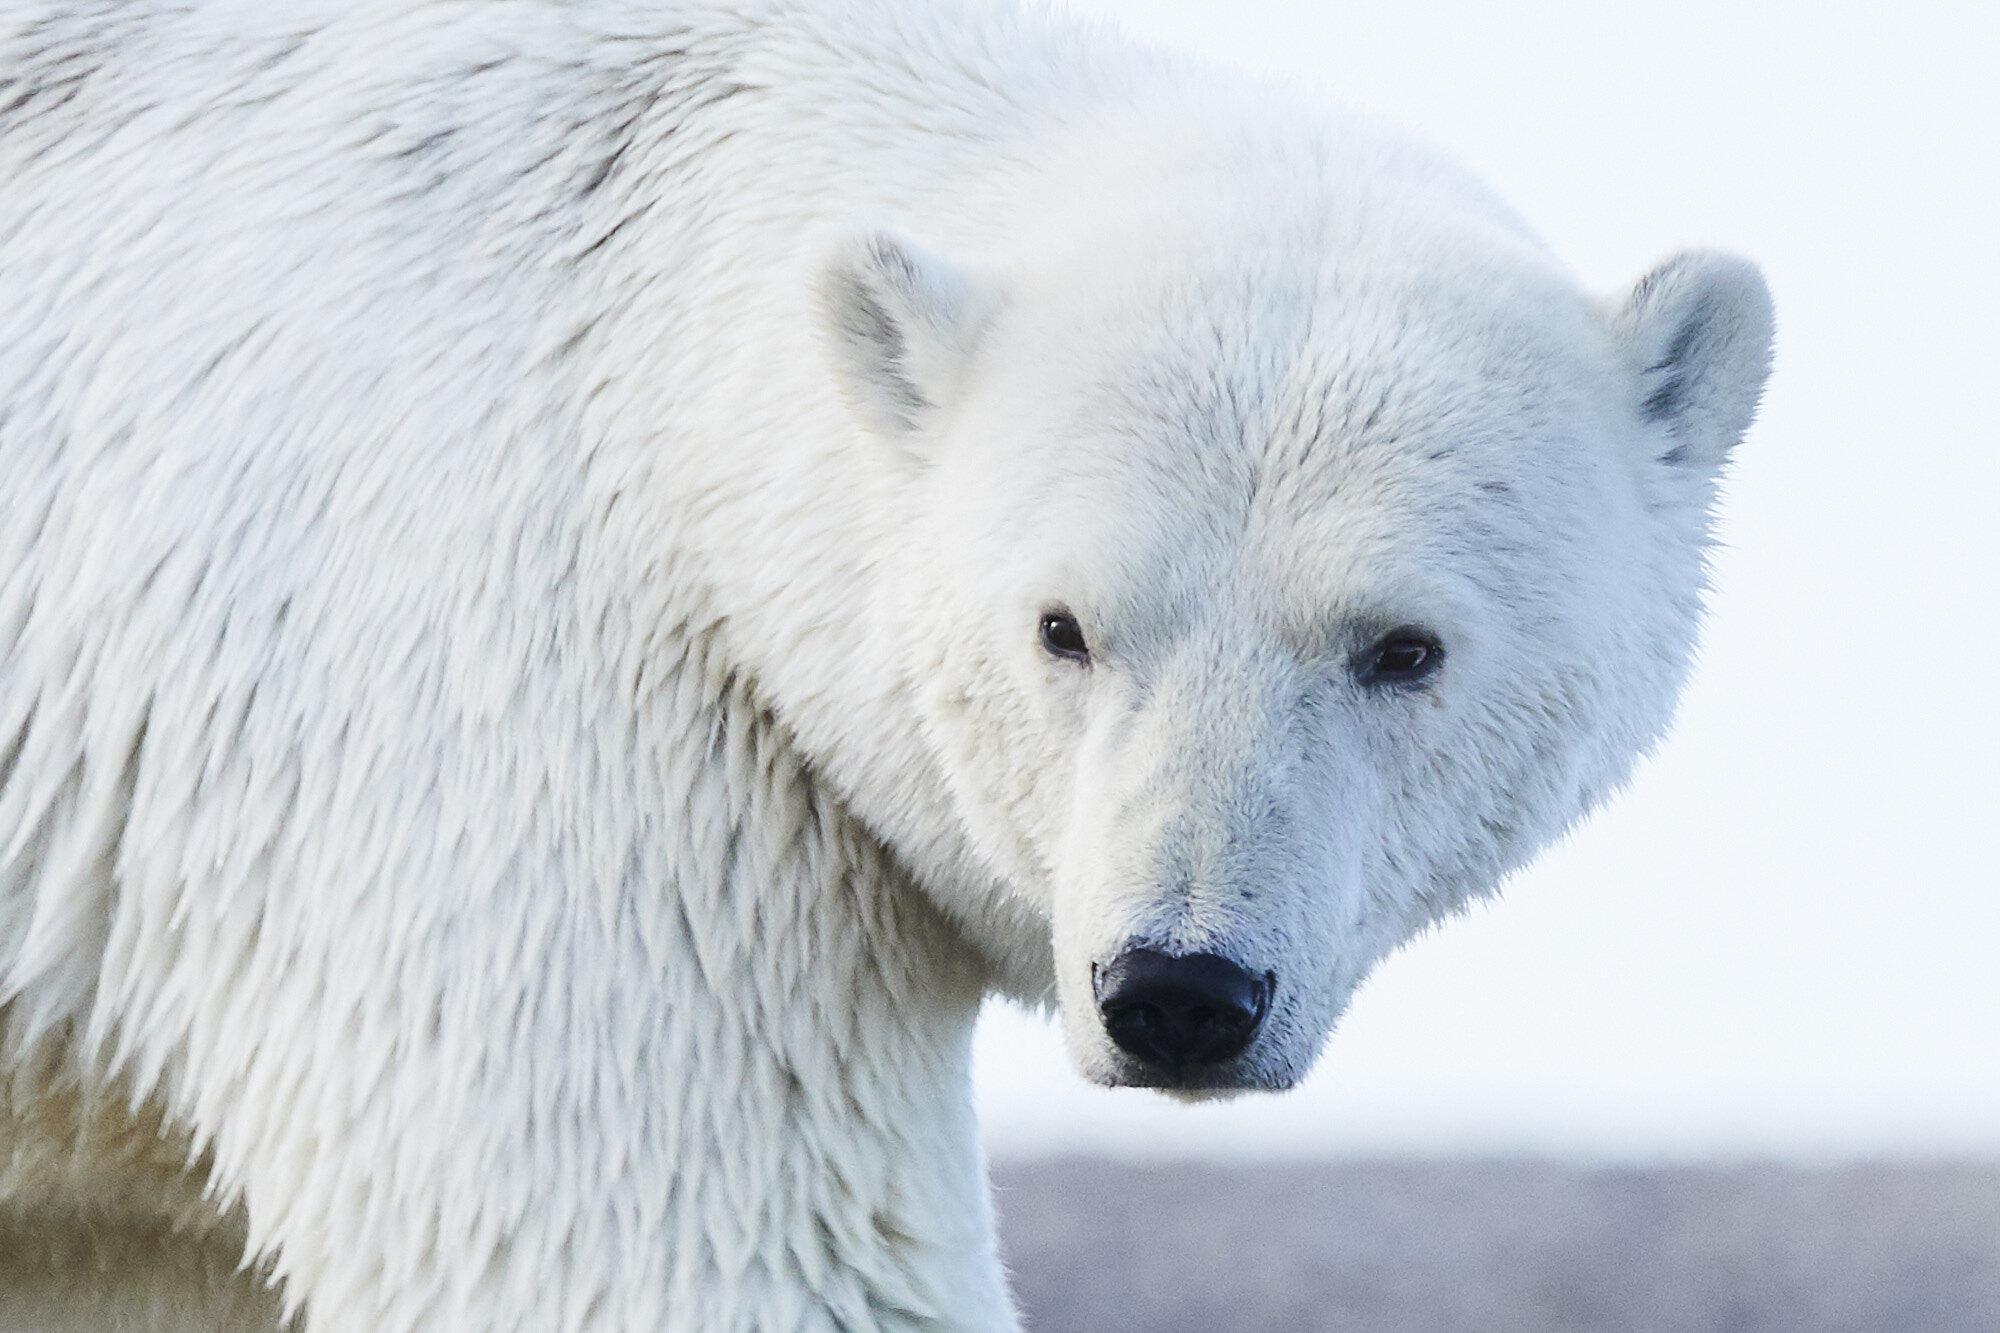 Alaska_Sept_2019_Polar Bears_416.jpg